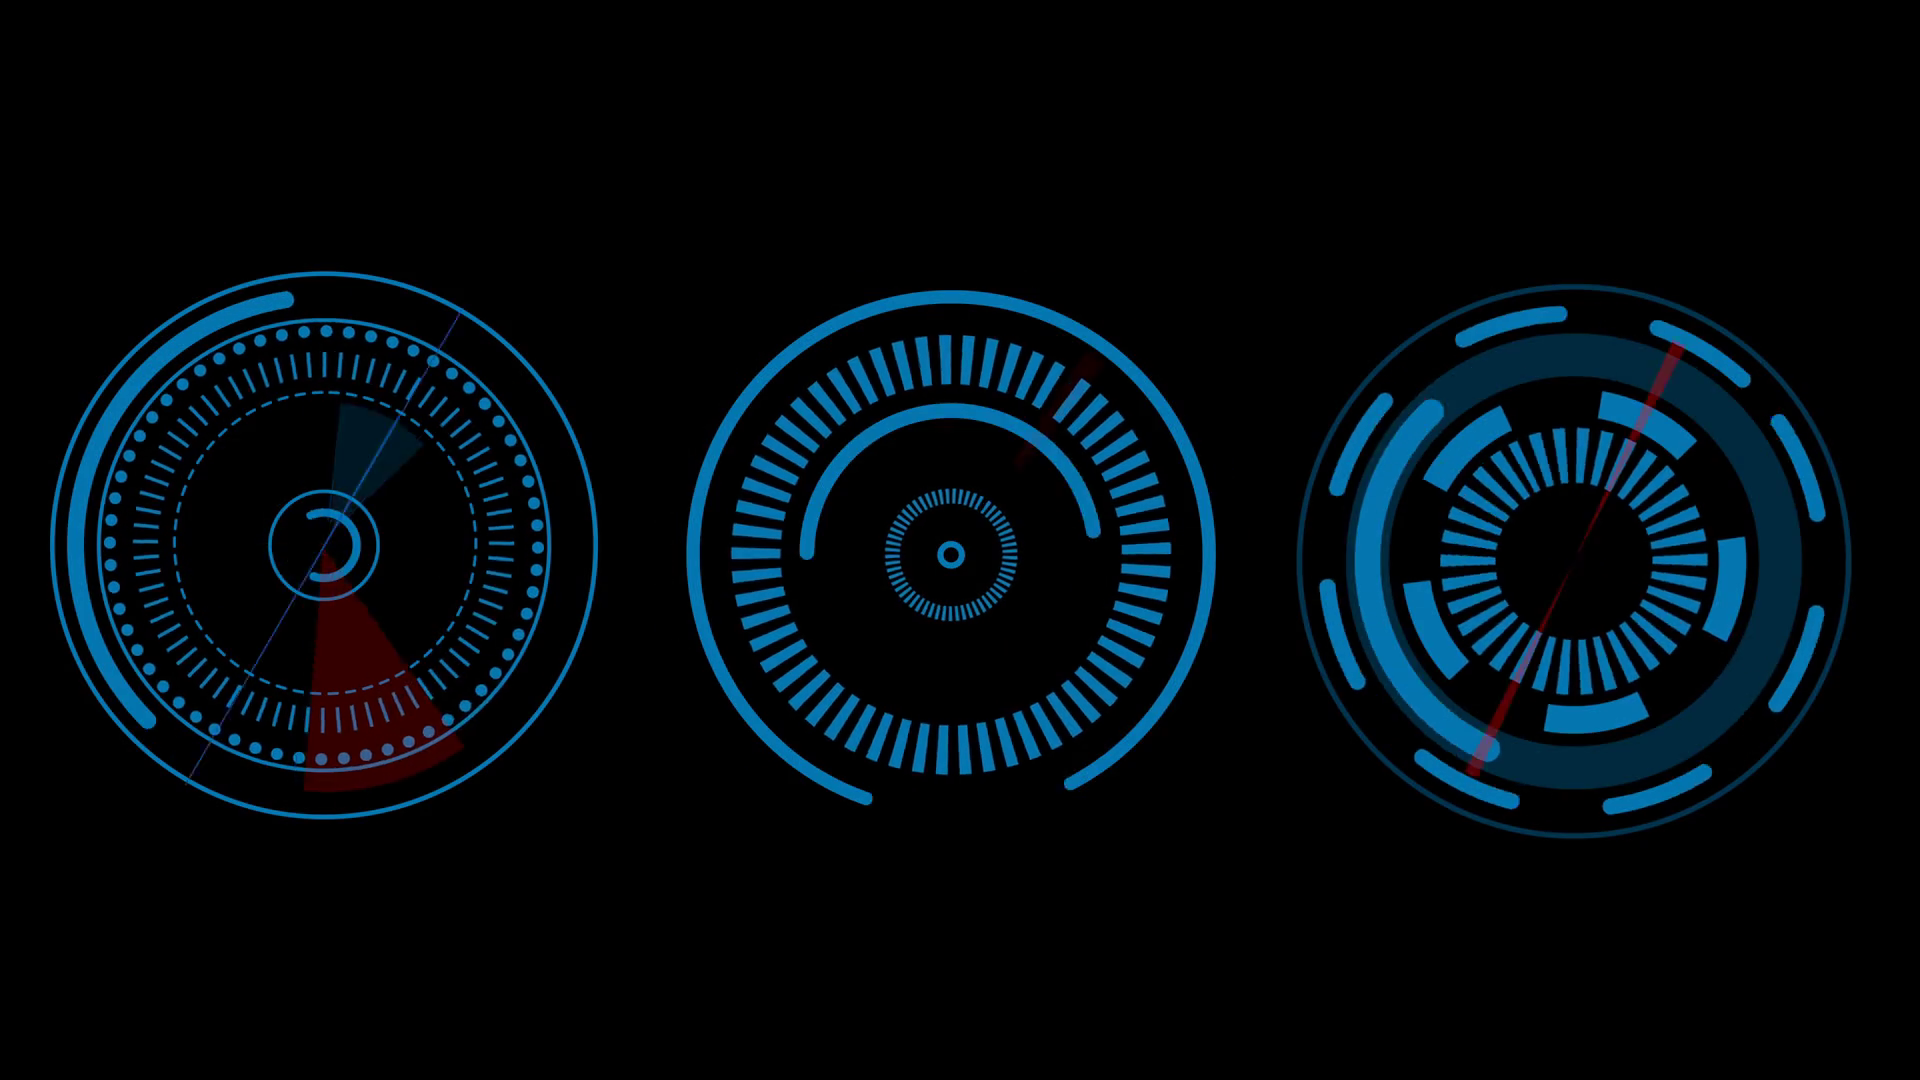 HUD Elements UI Elements. HUD Concept. Radial futuristic interface design  elements Motion Background.